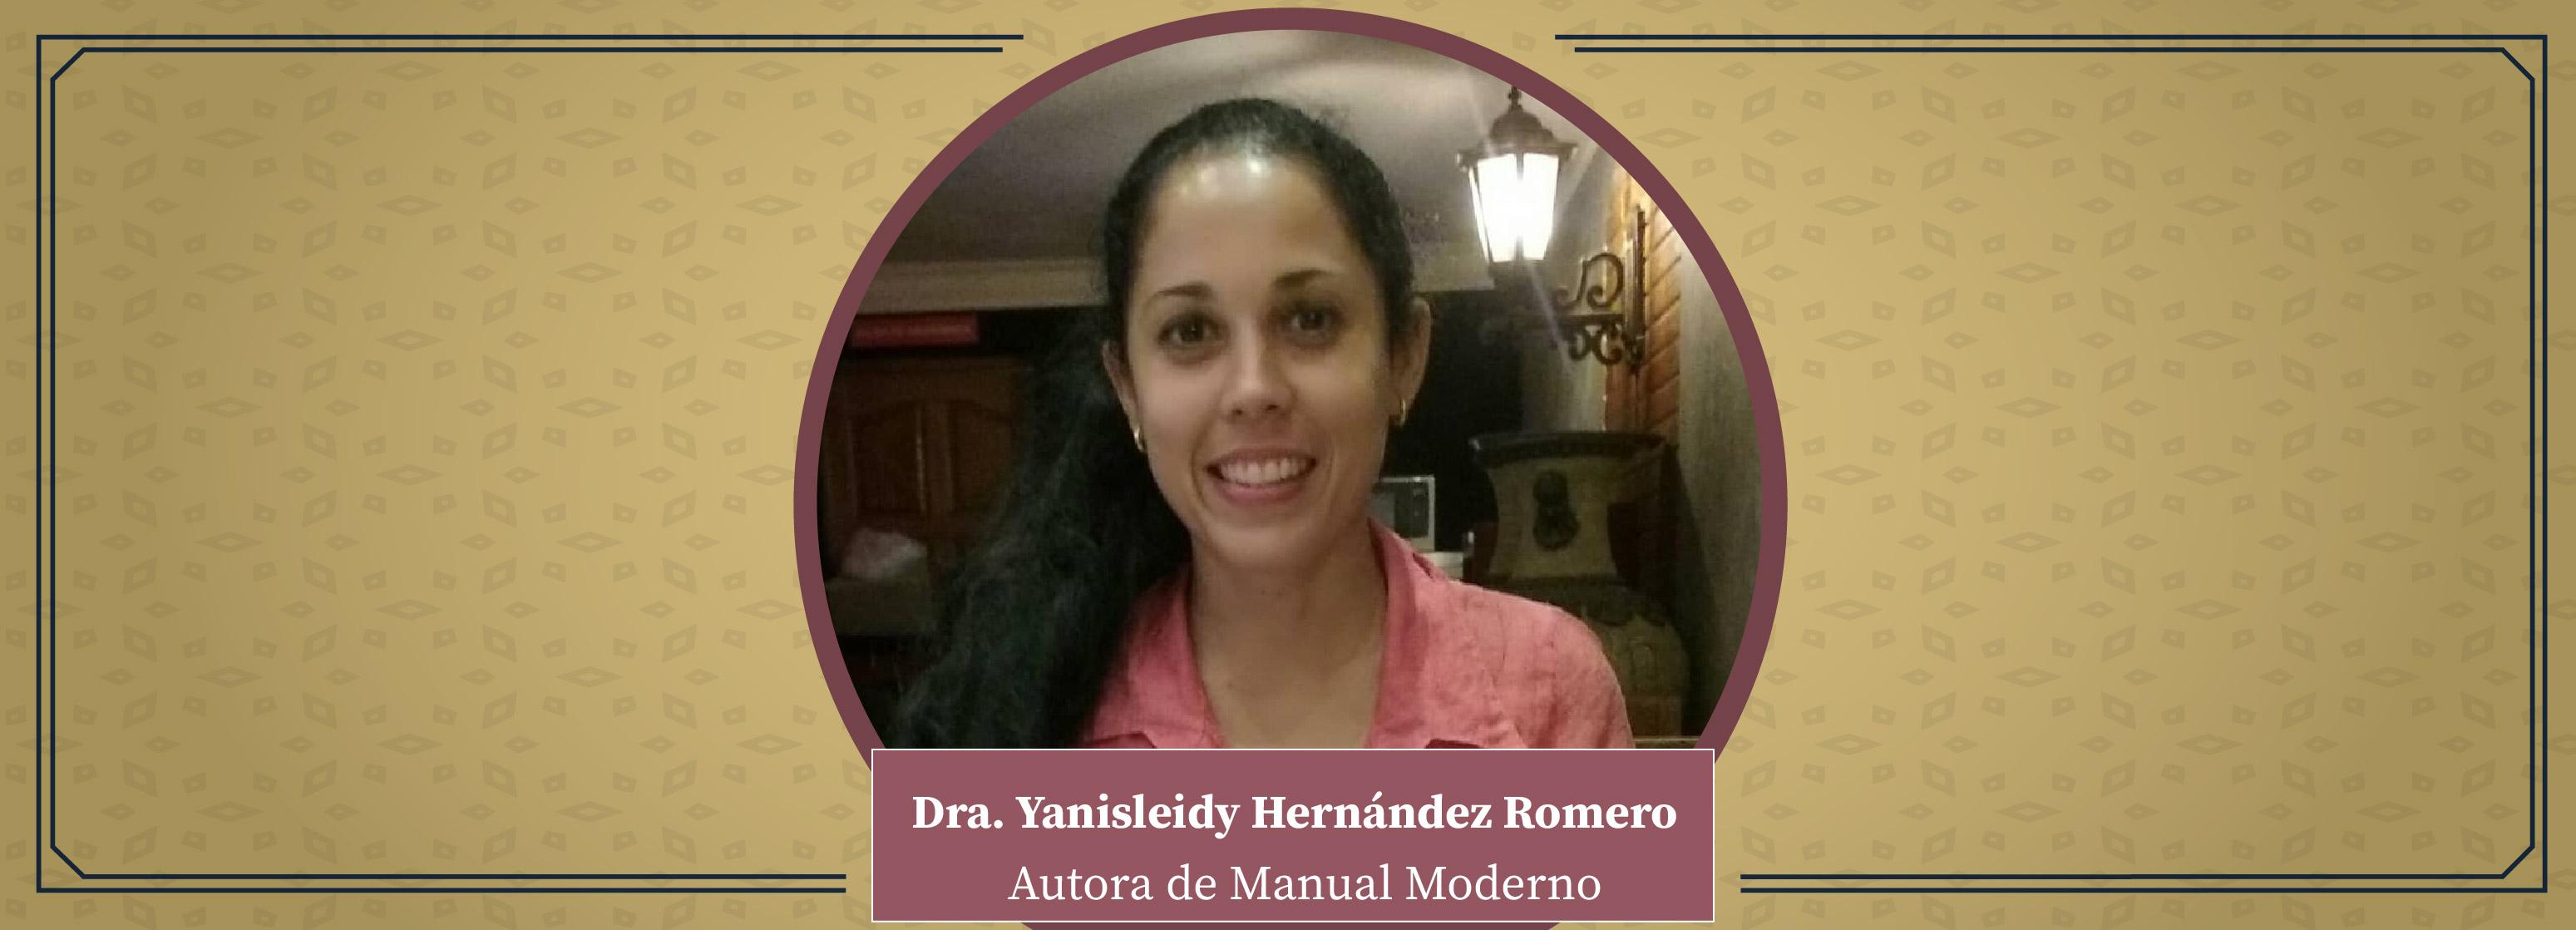 Nuestros Autores. Dra. Yanisleidy Hernández Romero